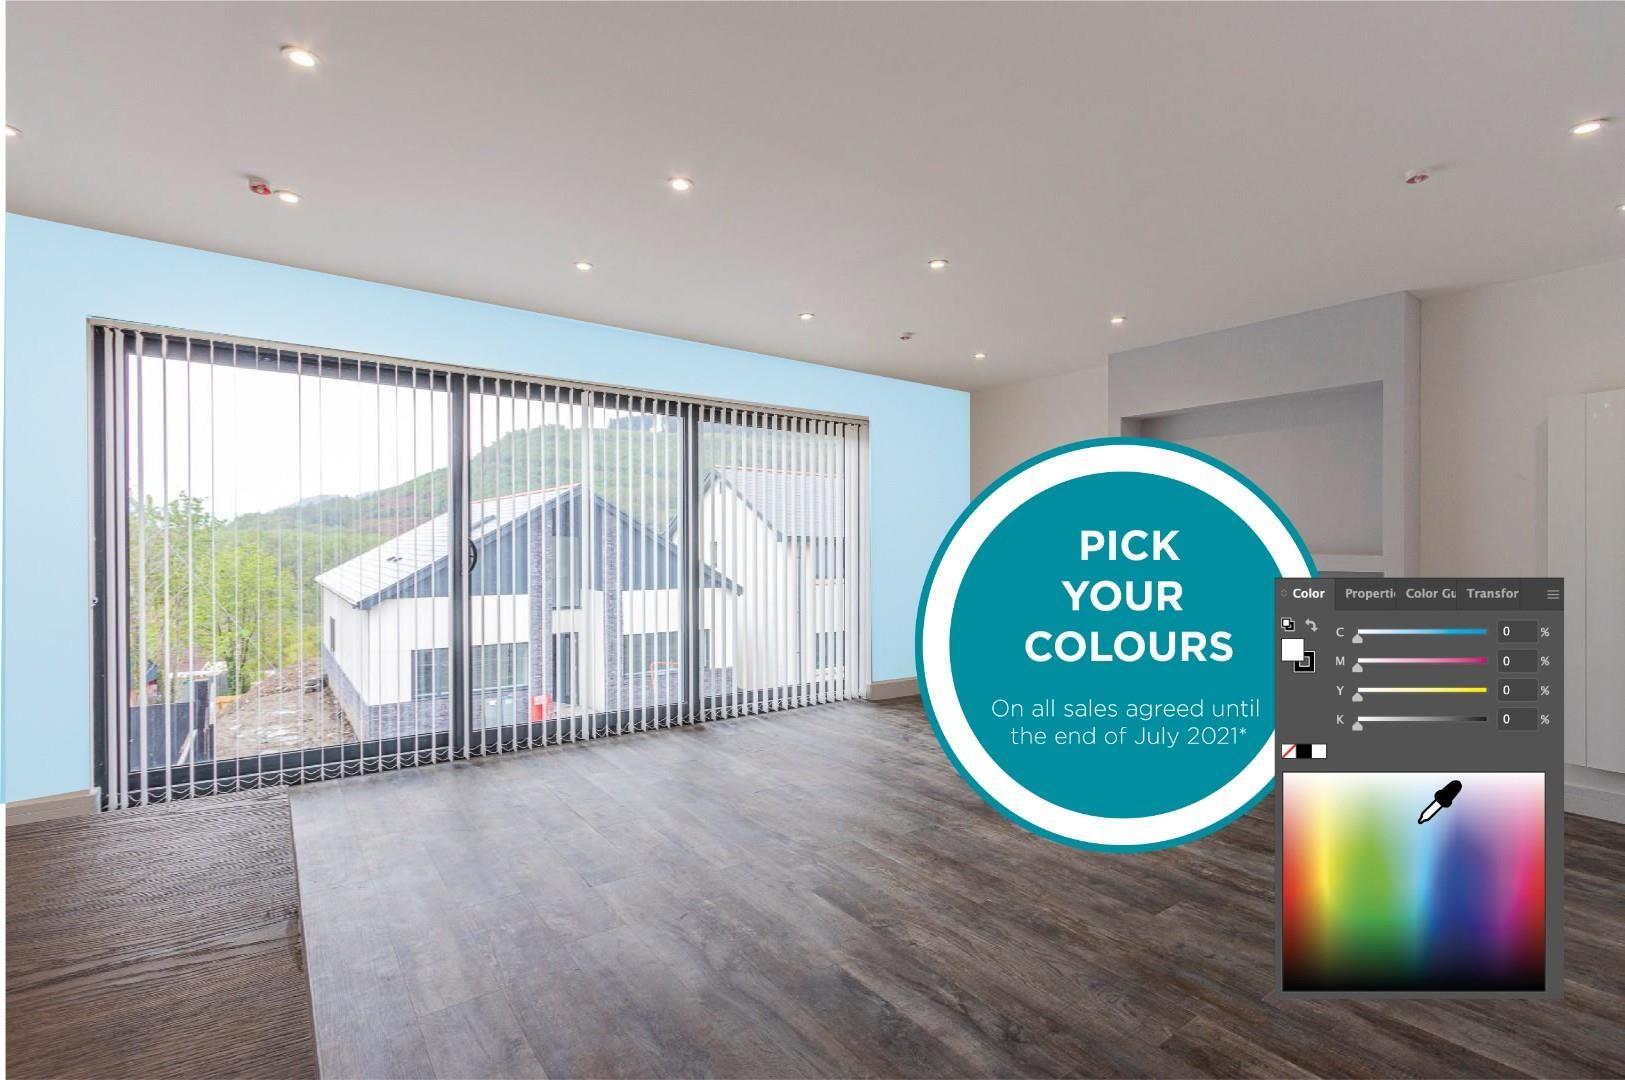 Property photo 1 of 18. Pc Colour Picker@300x-100.Jpg